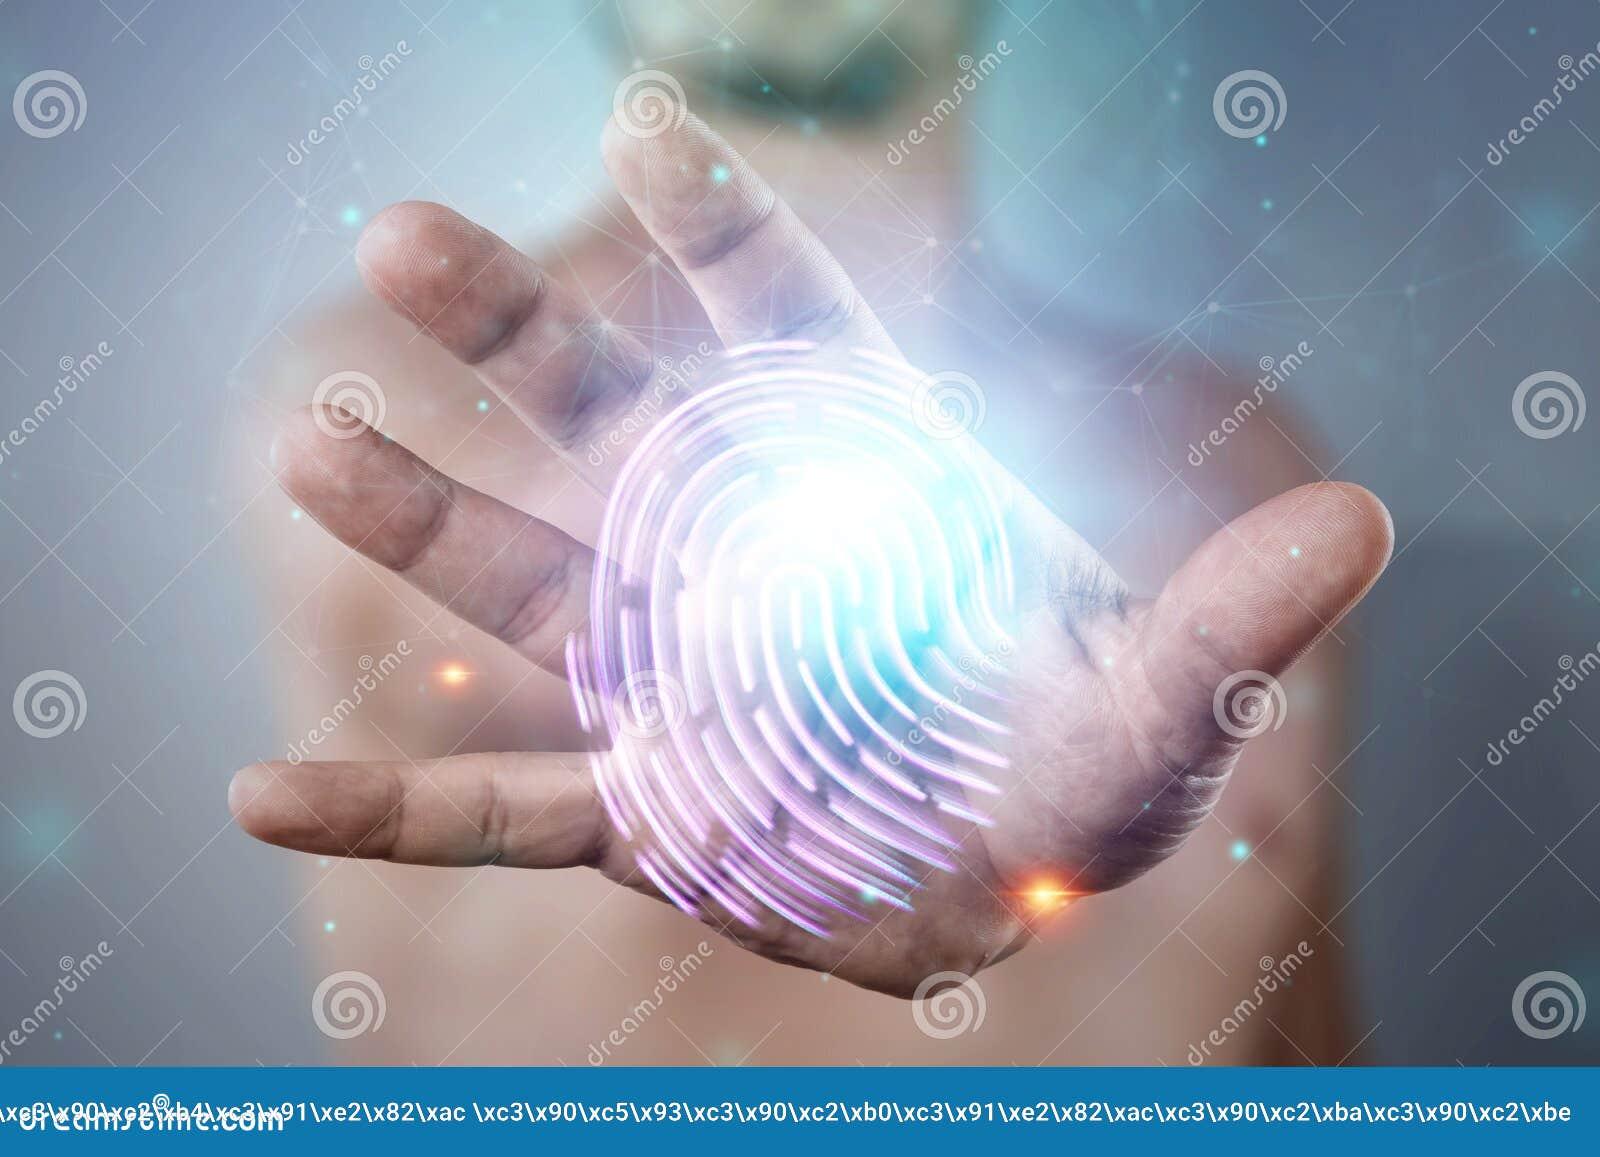 Hologram fingerprint, male hand scanning fingerprints. concept of fingerprint, biometrics, information technology and cyber